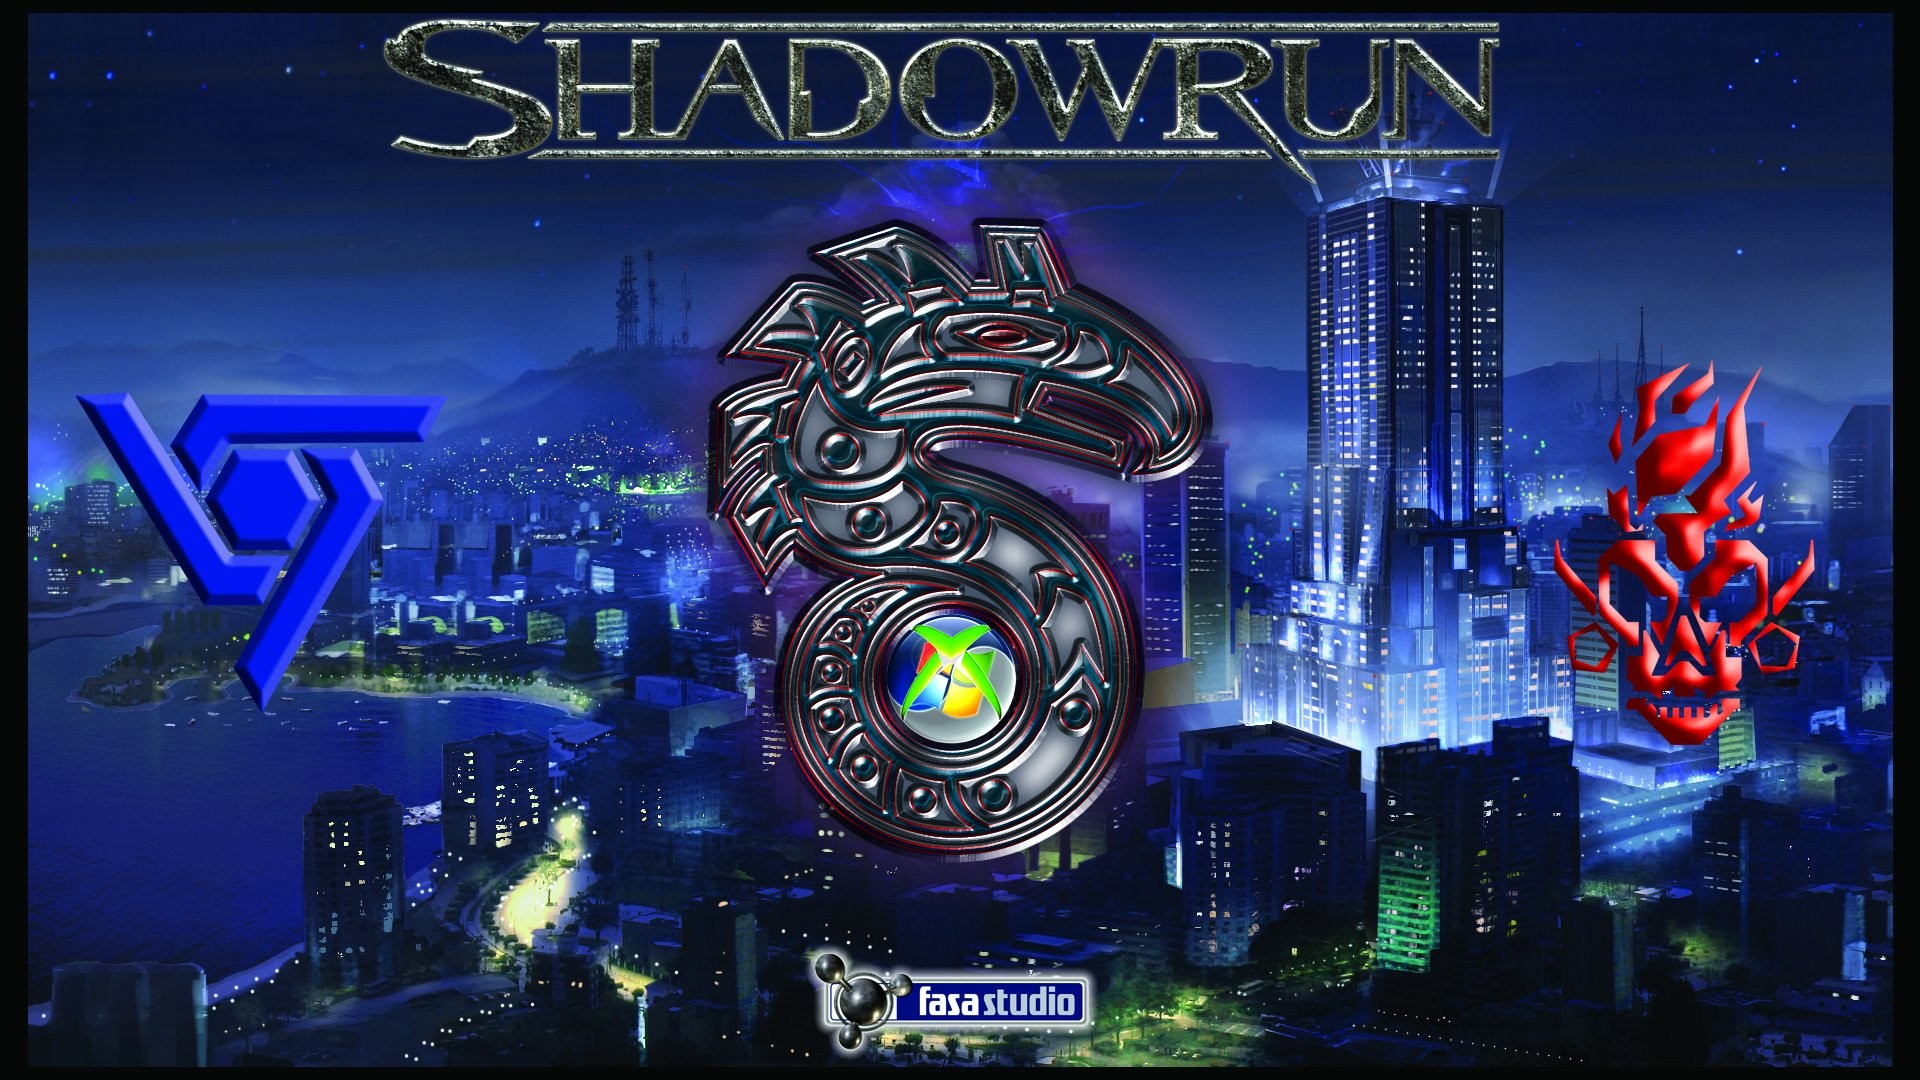 SHADOWRUN cardgame game mmo online fantasy sci-fi warrior fighting  cyberpunk shooter (44) wallpaper | | 348463 | WallpaperUP